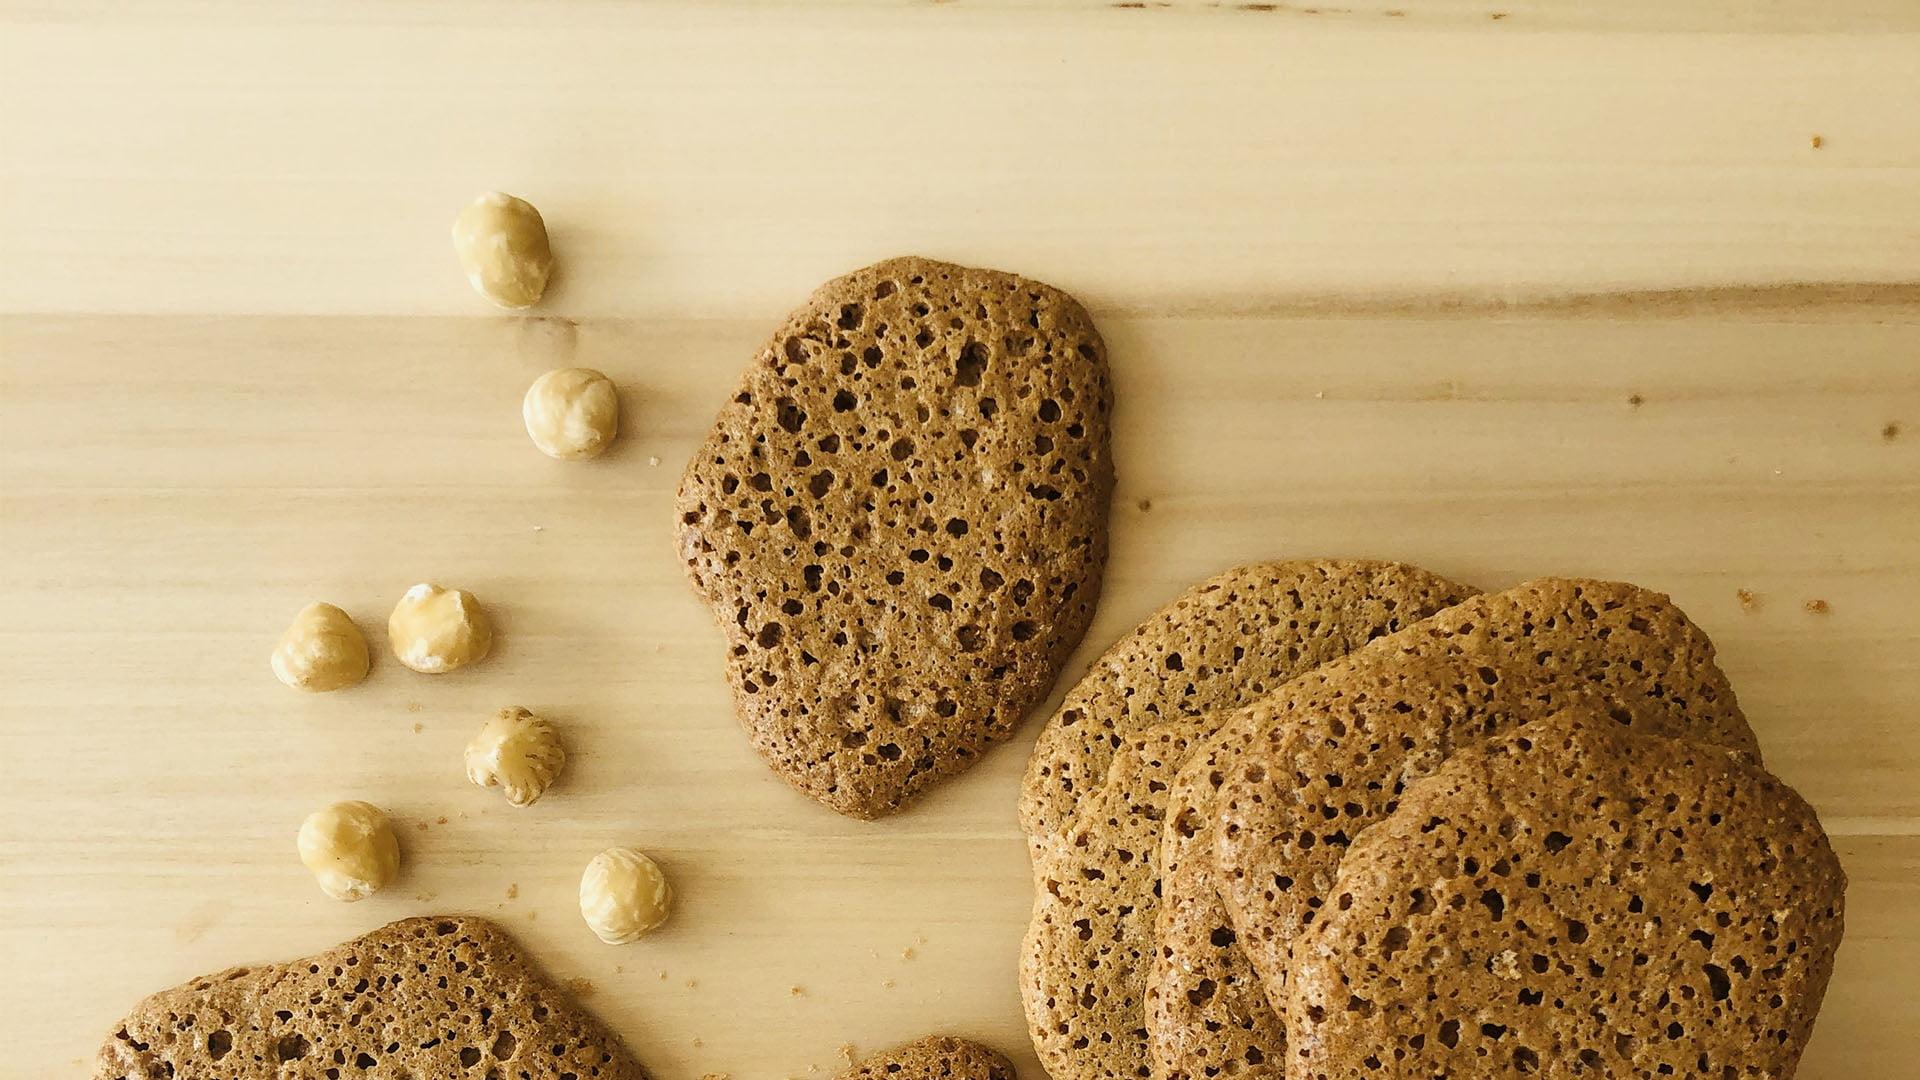 How To Blanch Hazelnuts